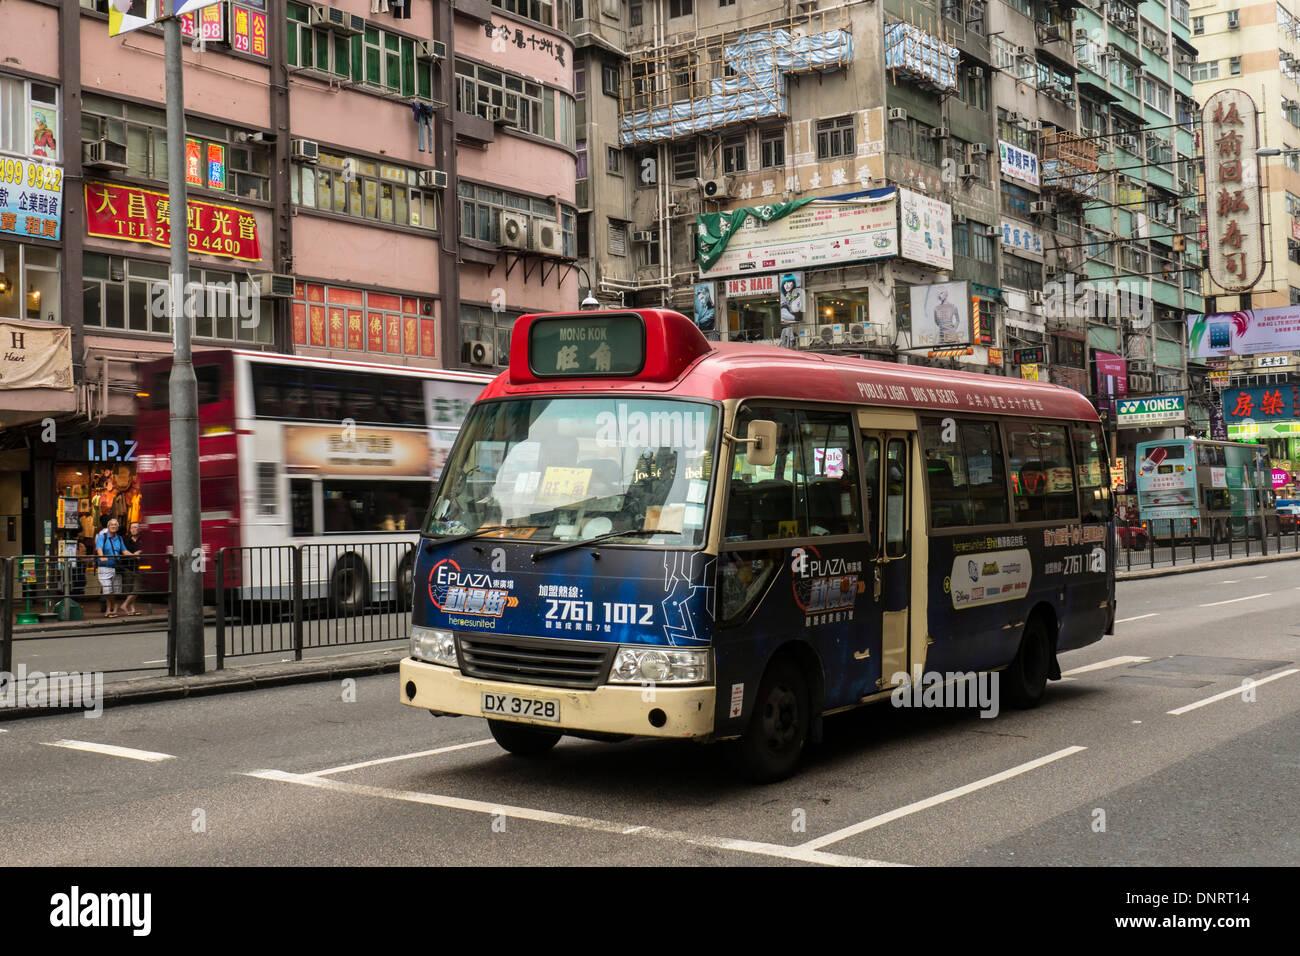 Minibus Running on the Street of Kowloon, Hong Kong, China - Stock Image